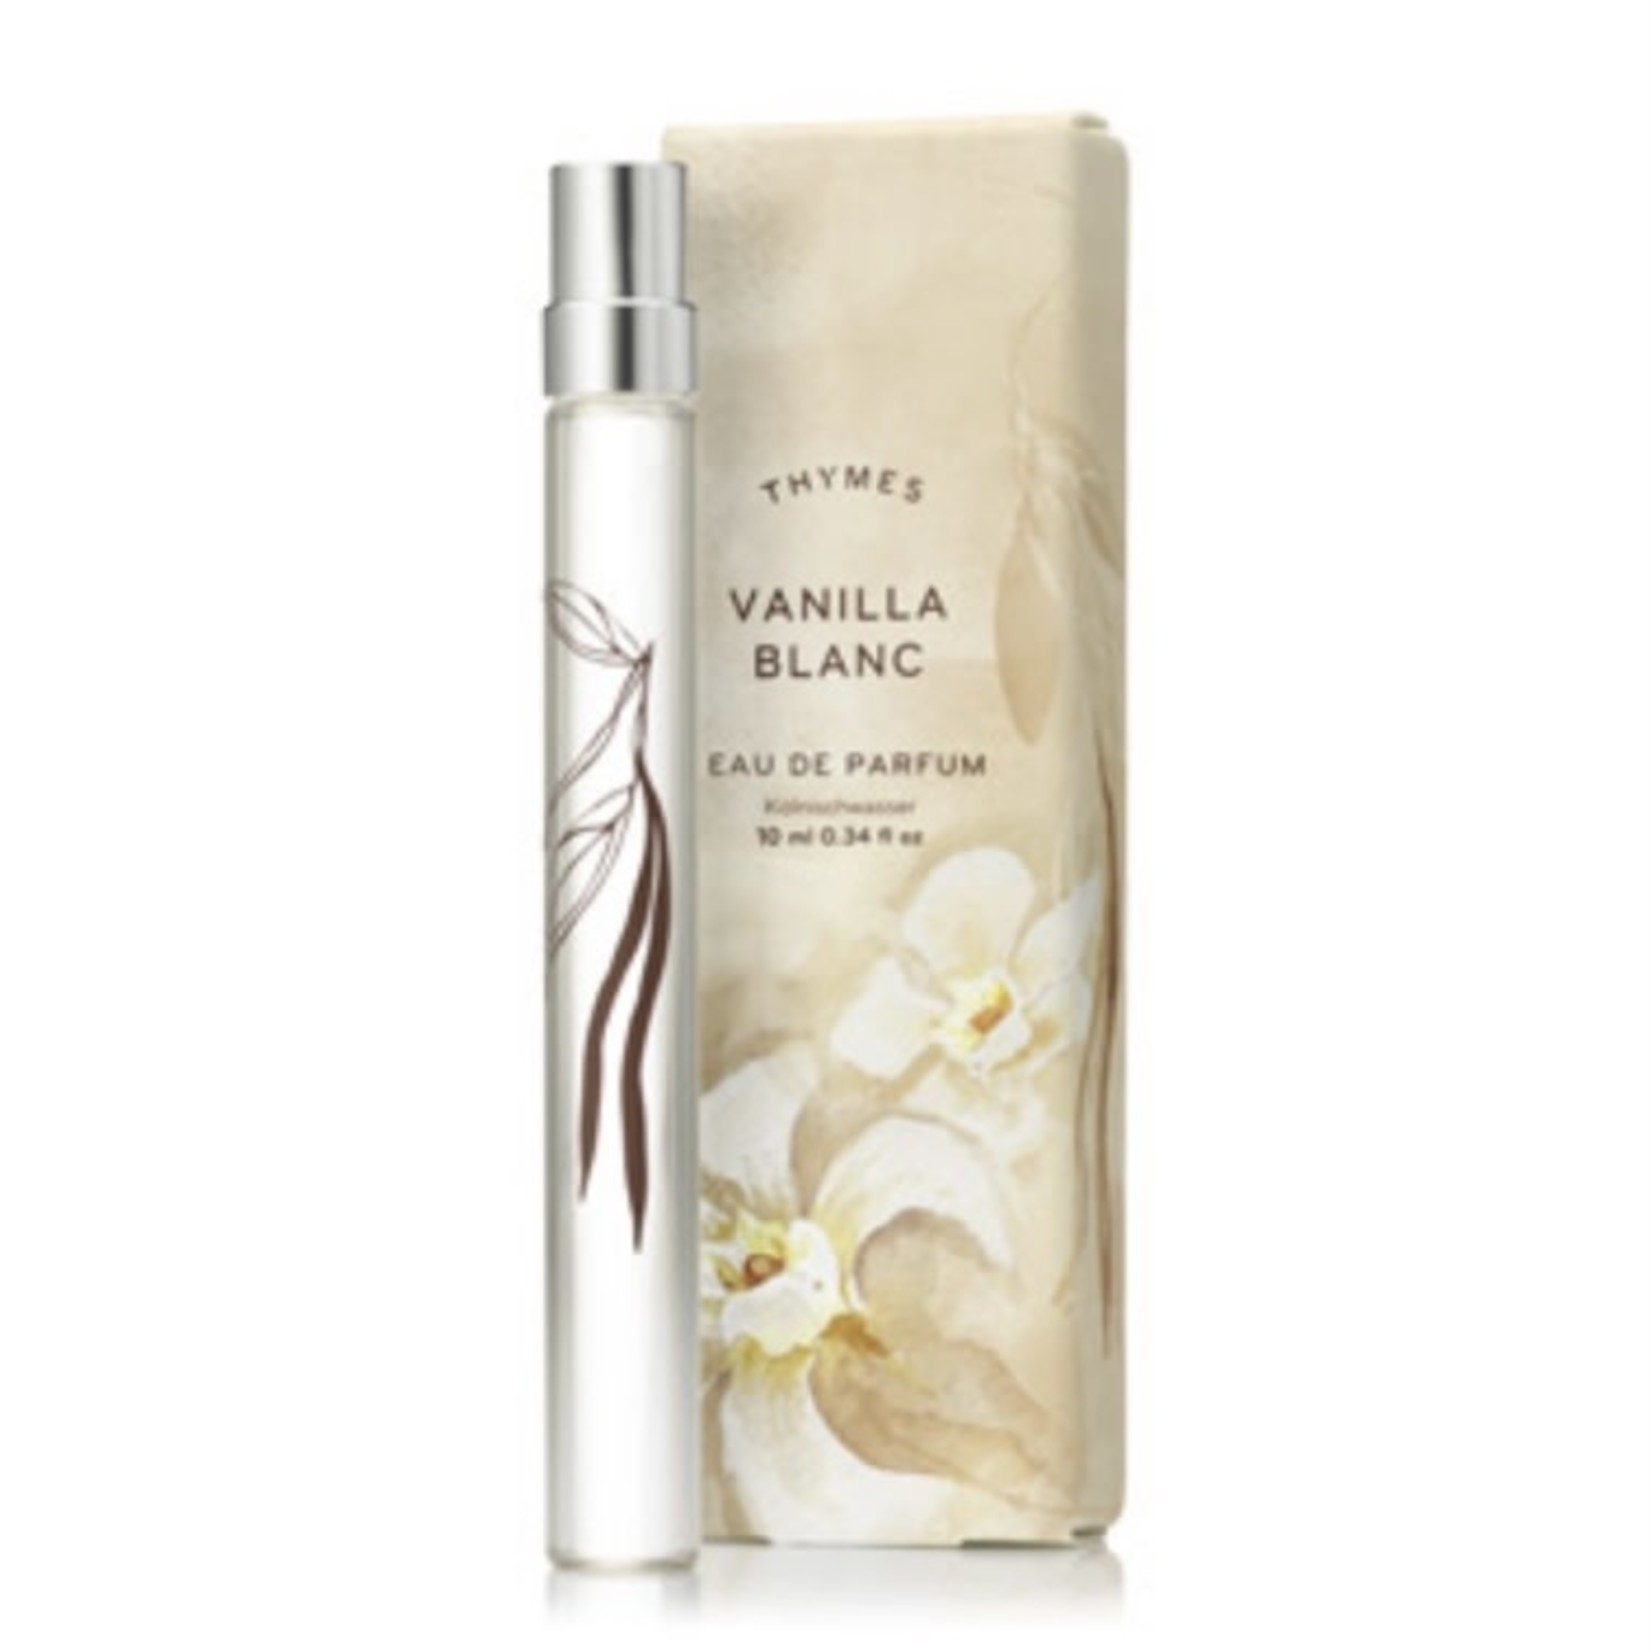 Thymes vanilla blanc mini perfume